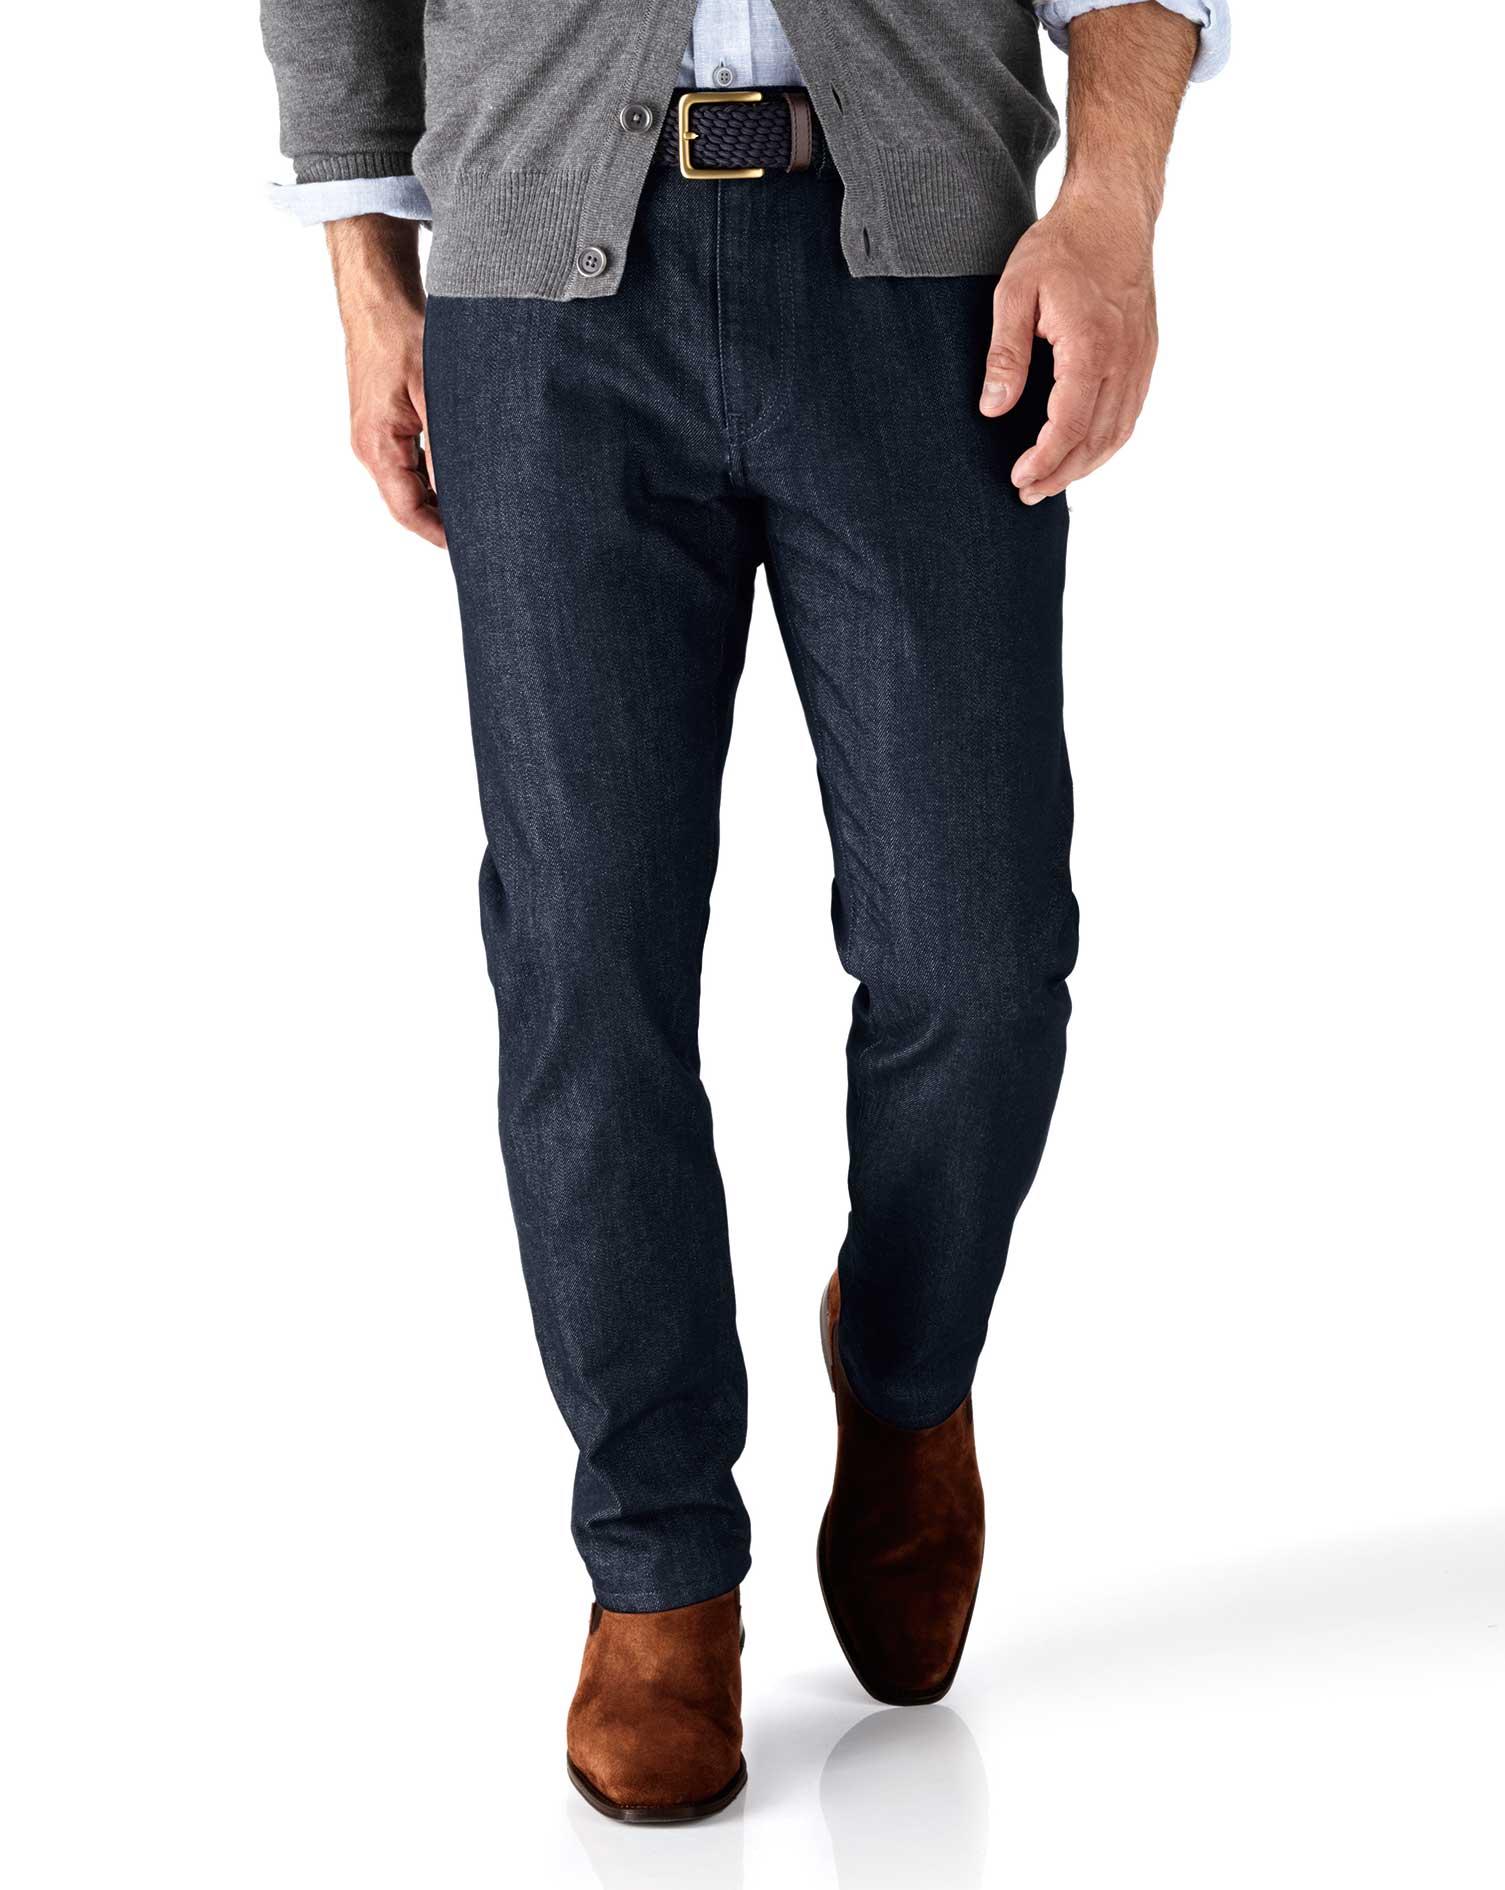 Dark Blue Slim Fit 5 Pocket Denim Jeans Size W34 L32 by Charles Tyrwhitt